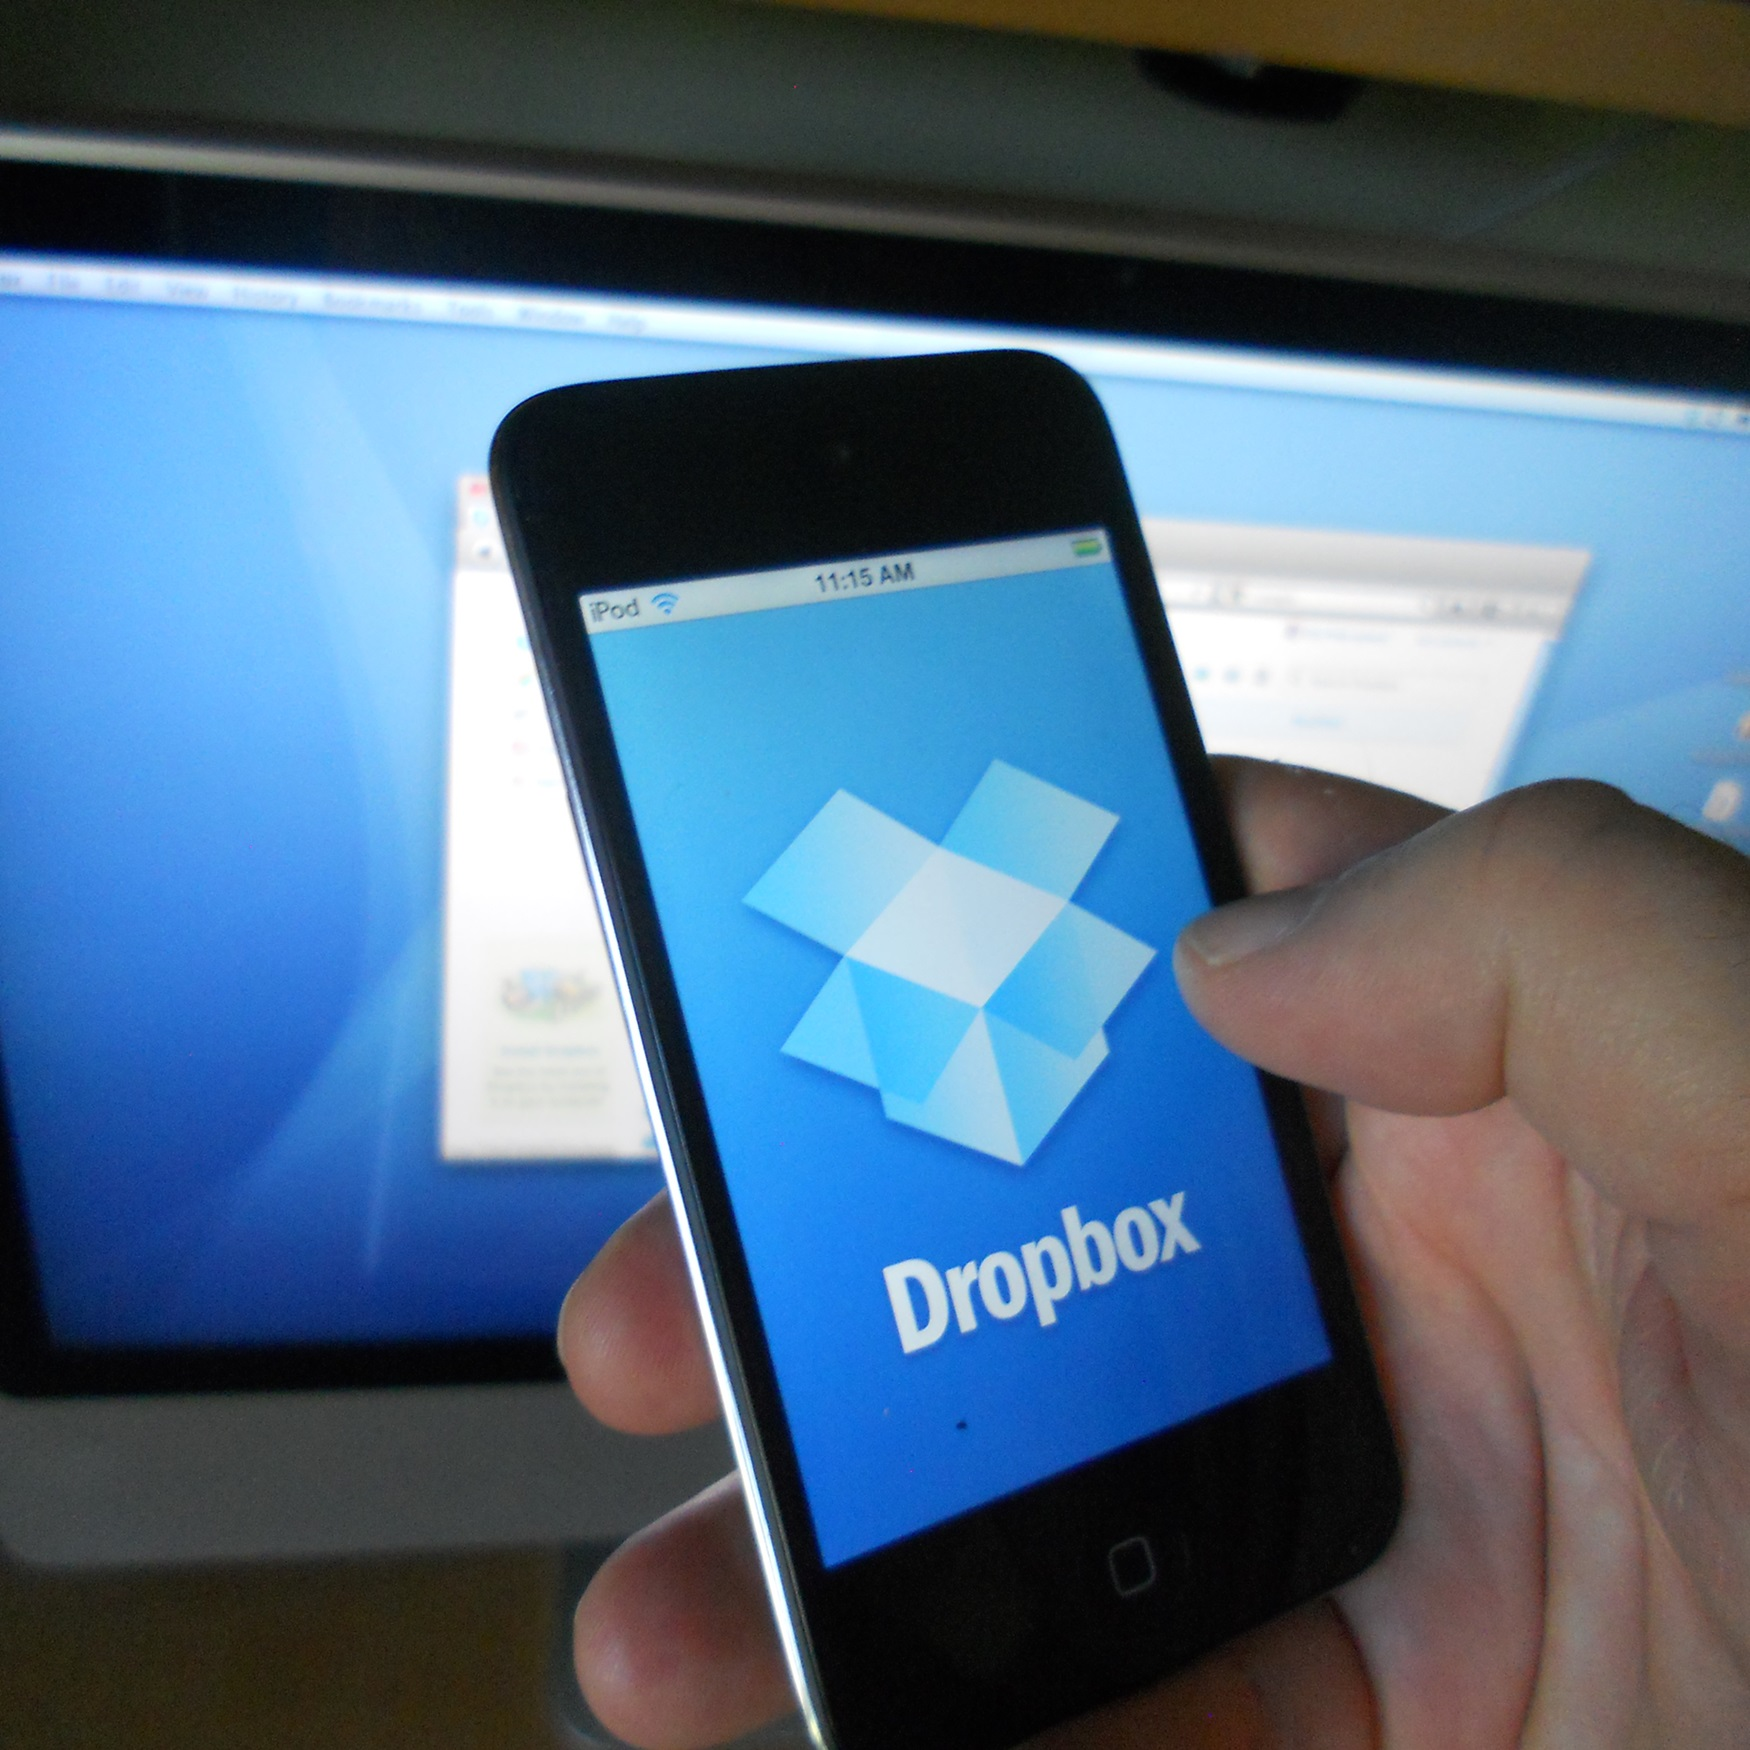 dropbox on a phone